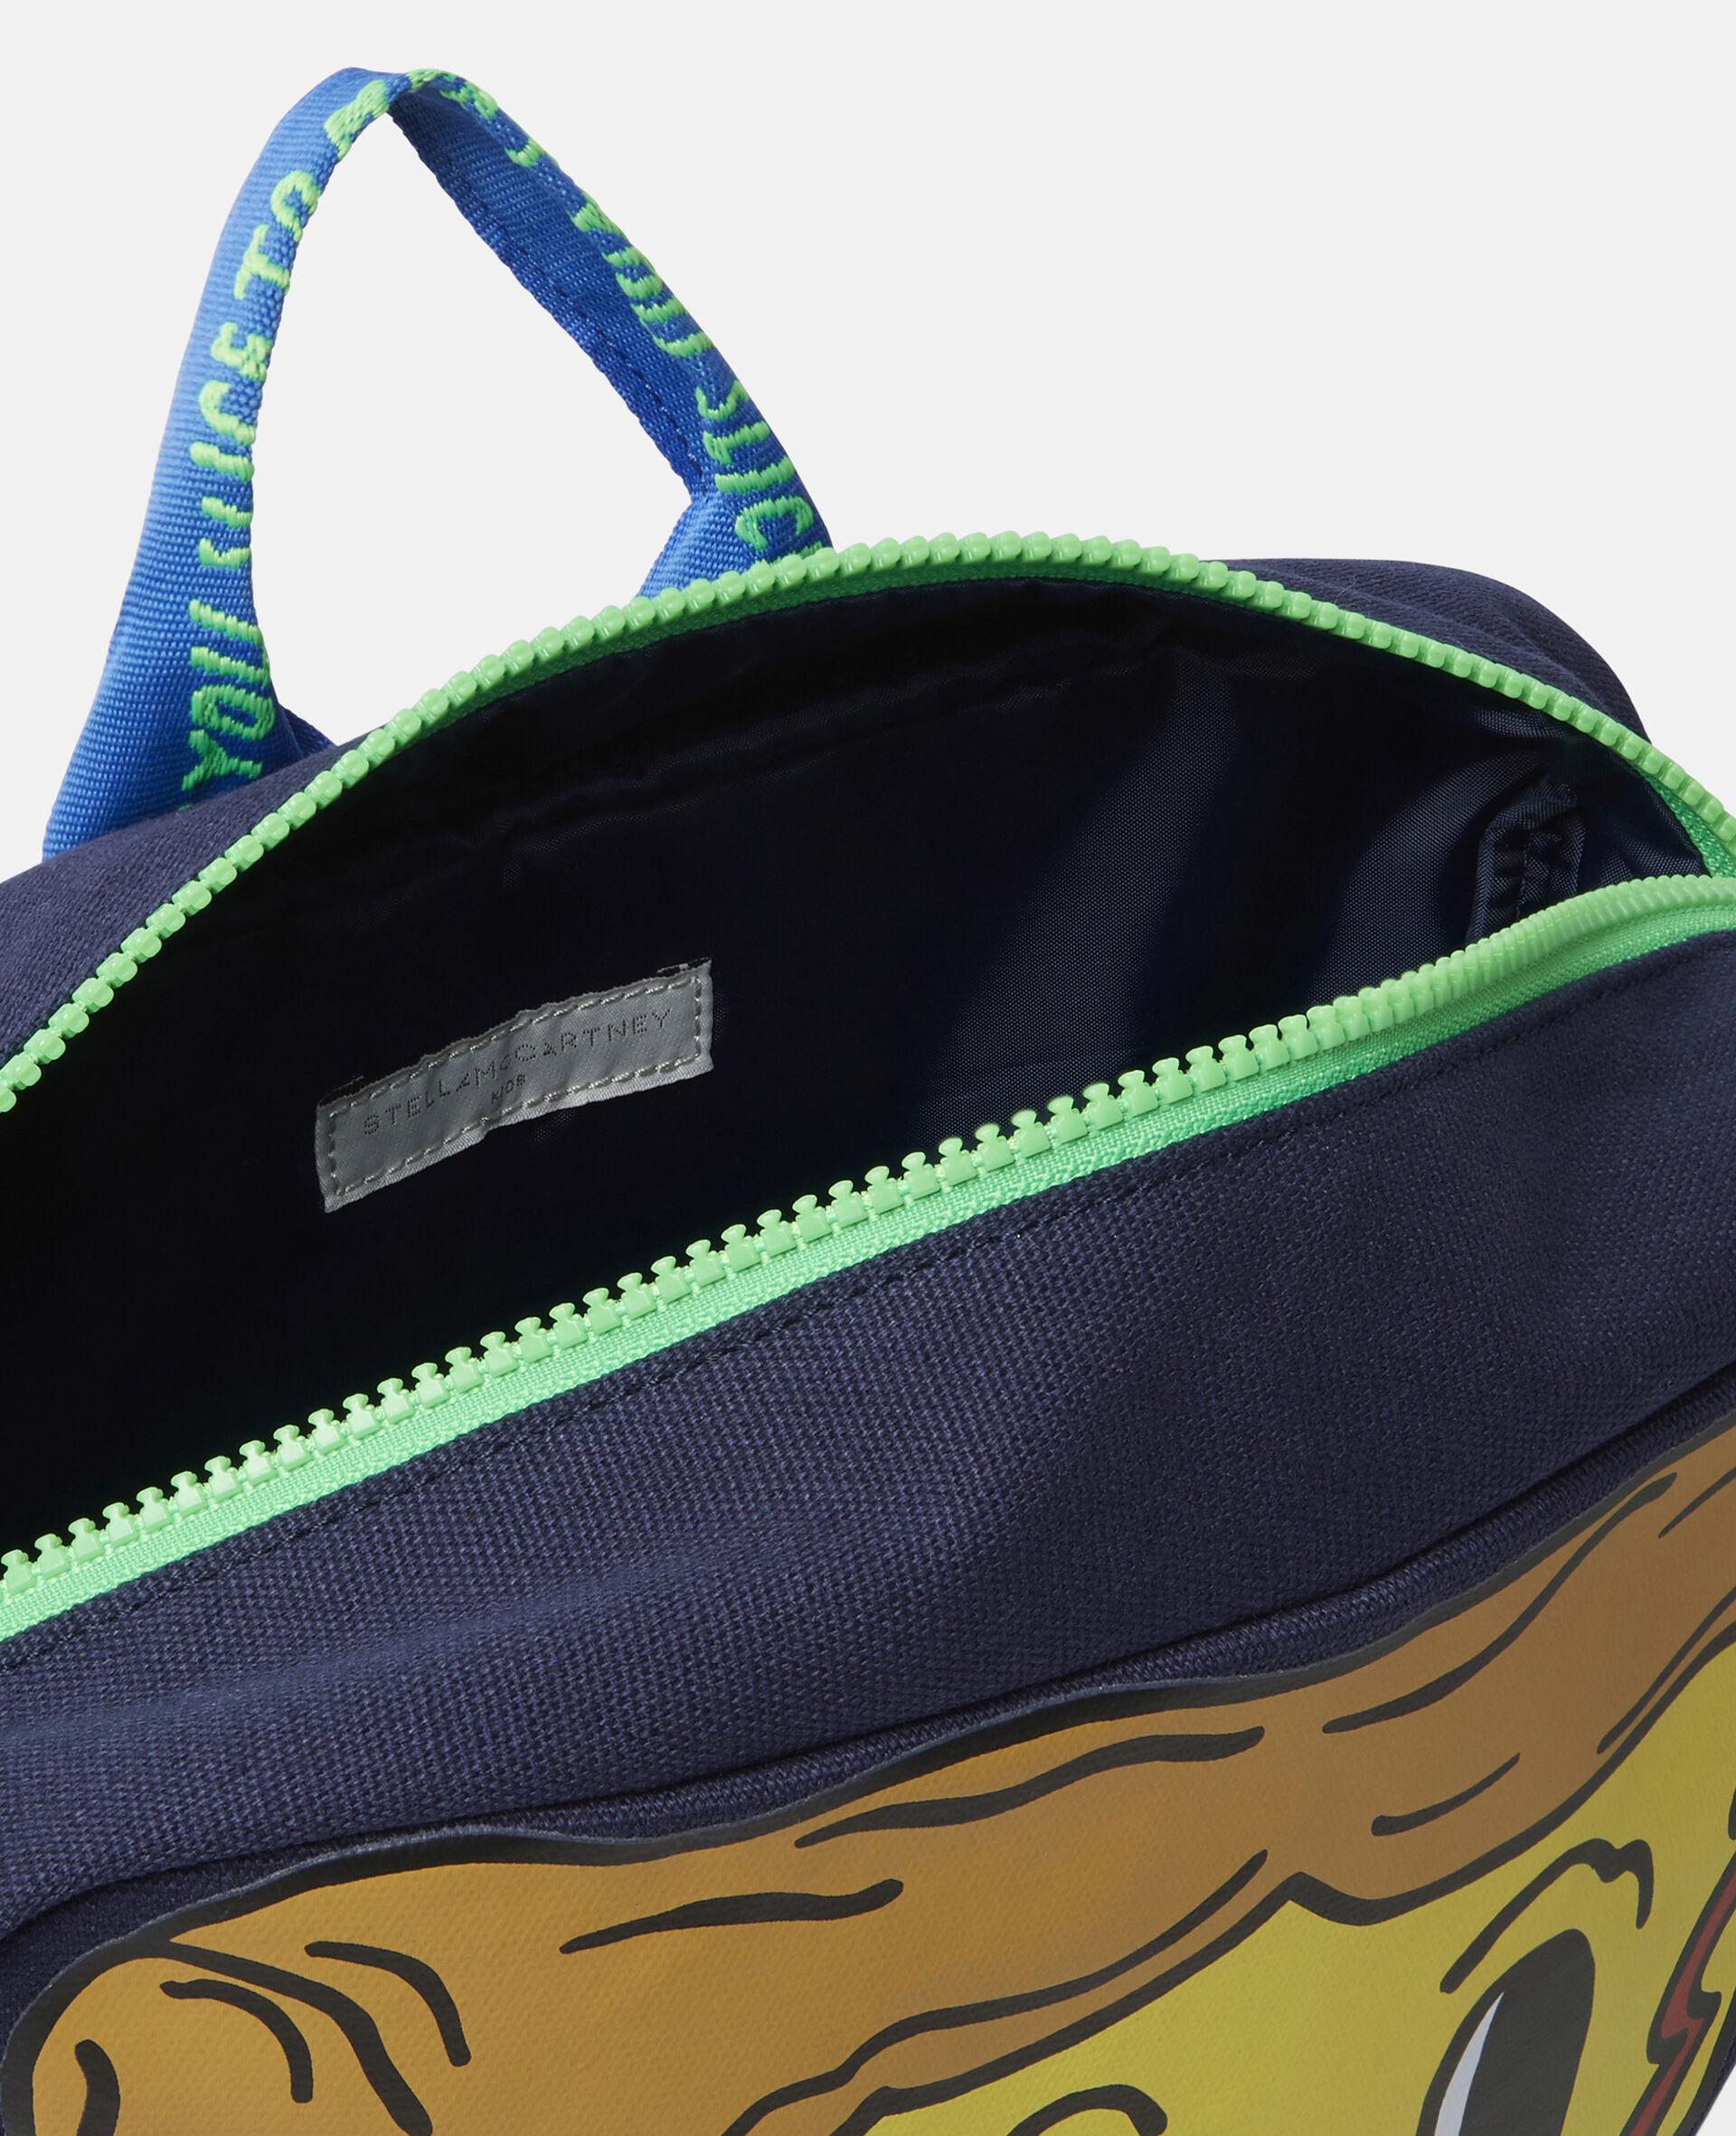 披萨切片造型帆布双肩包-蓝色-large image number 2